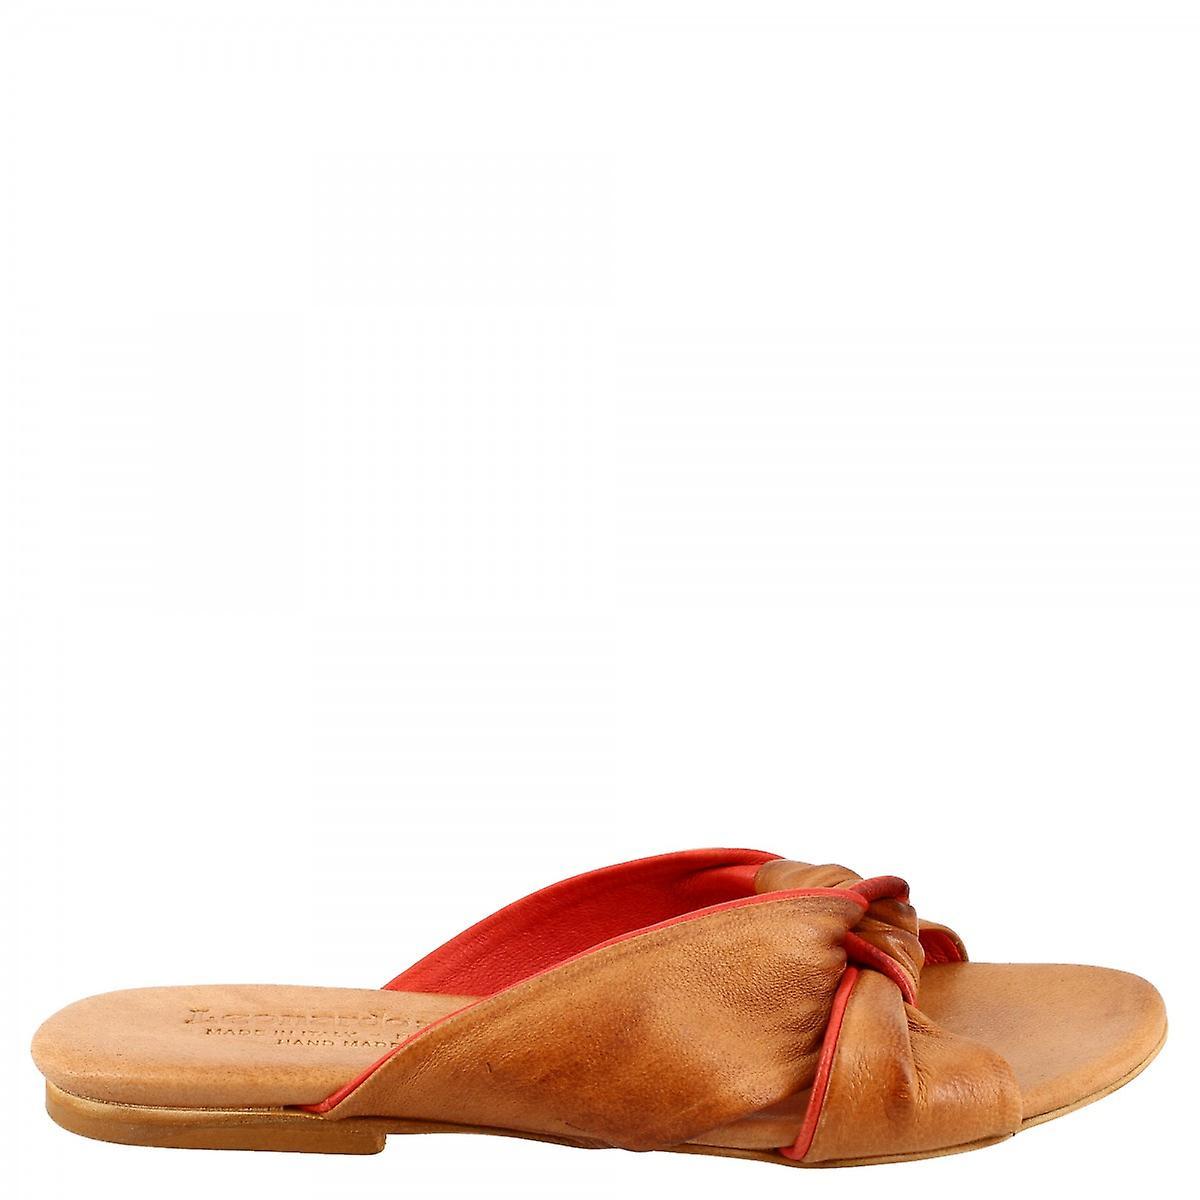 Leonardo Shoes Women's handmade flat slipper sandals in tan red goat and calf leather